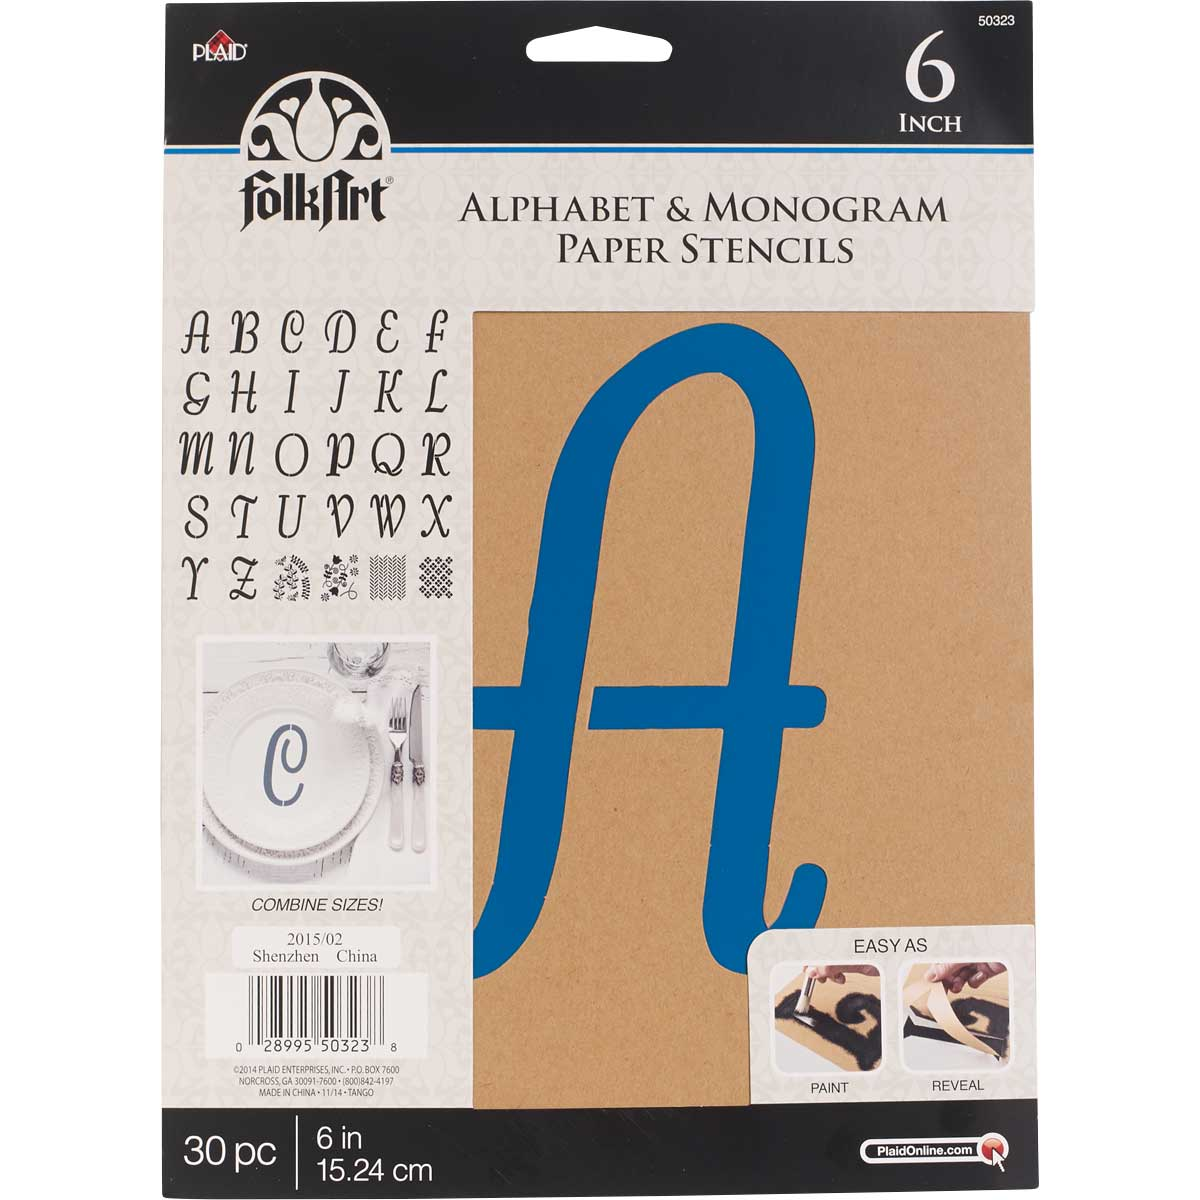 FolkArt ® Alphabet & Monogram Paper Stencils - Italic Font, 6